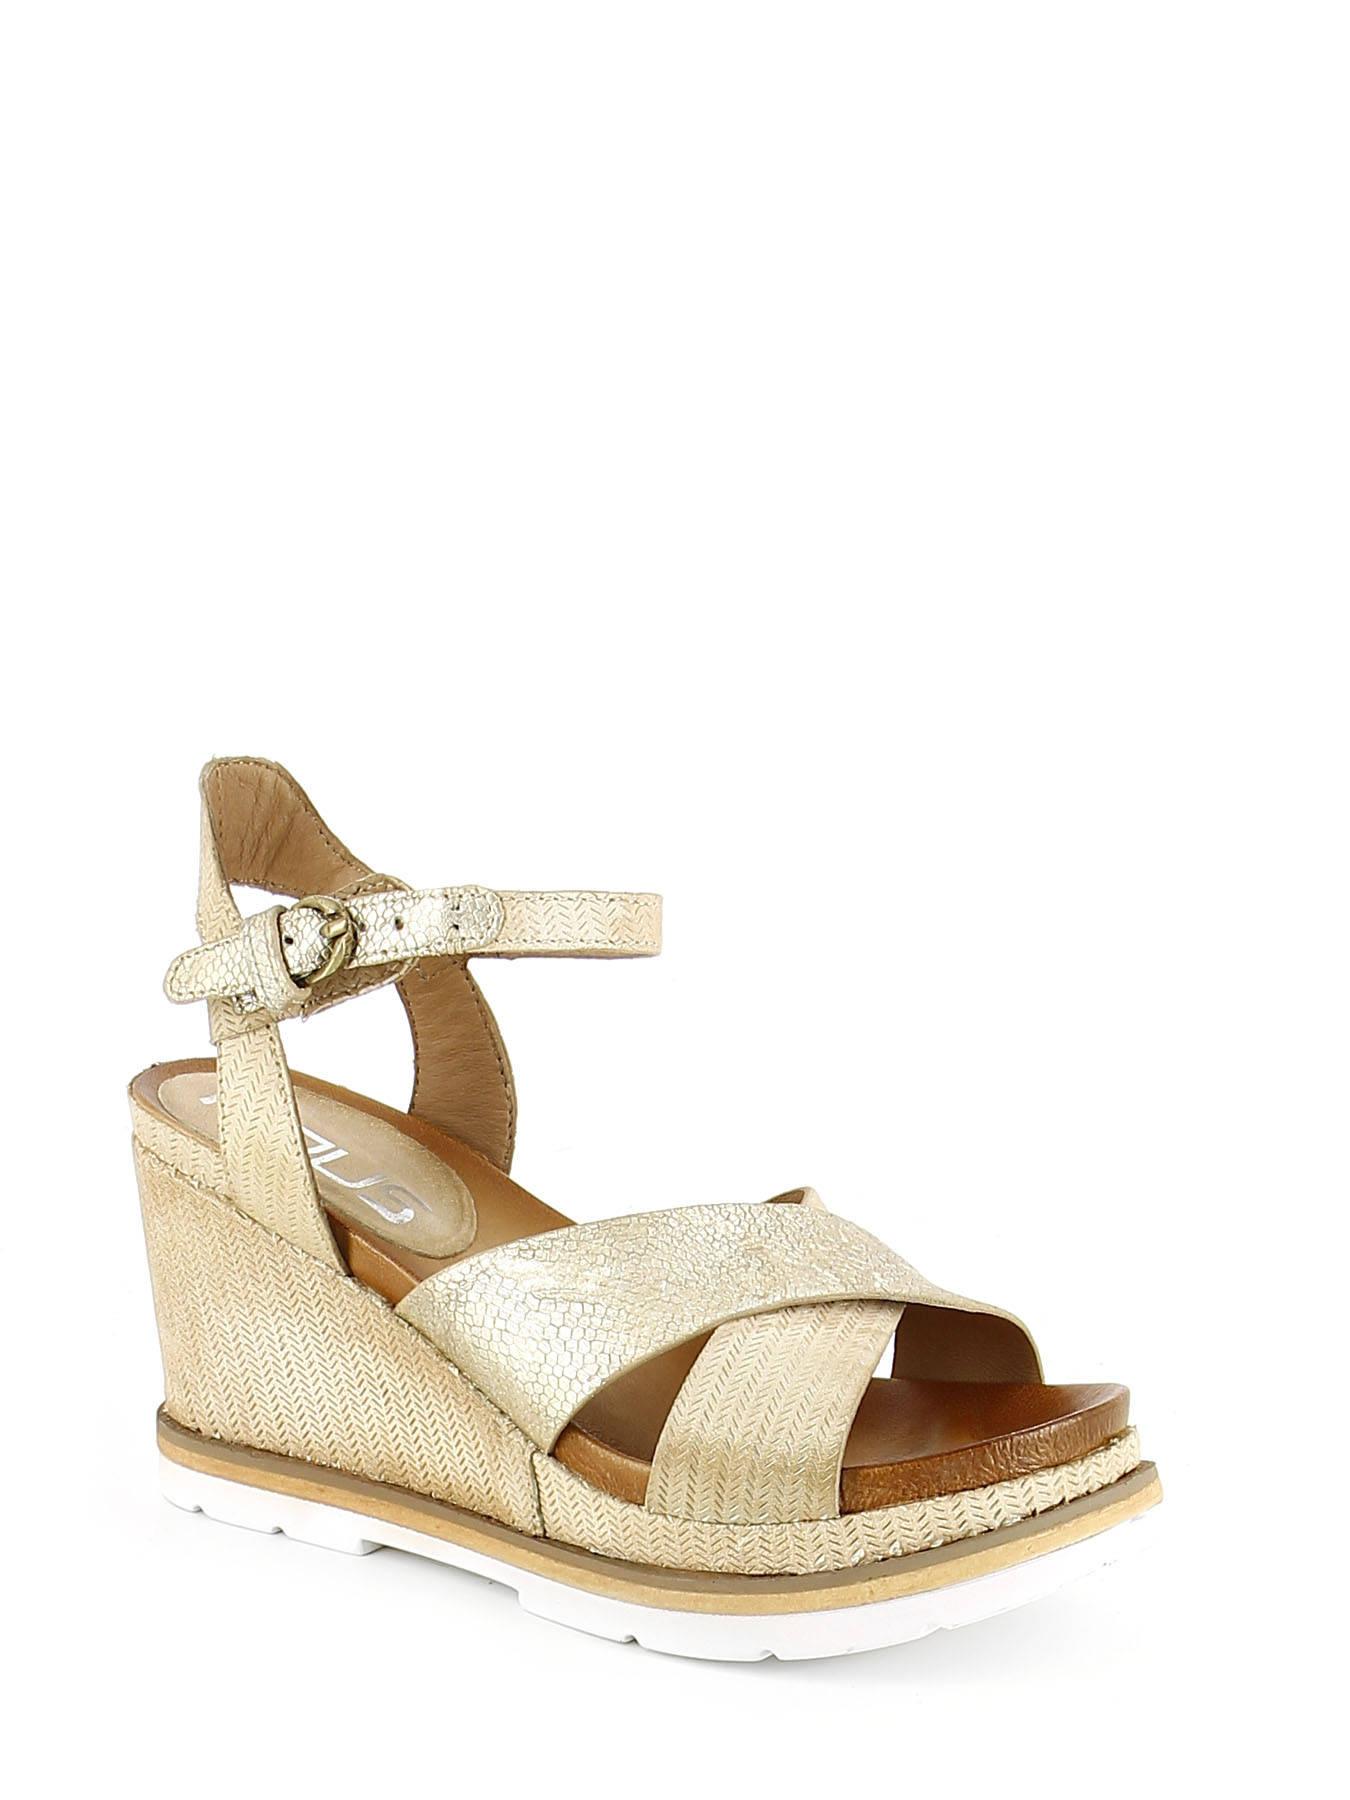 9ea0a0de58dc ... Sandals Wedge Heel Mjus Gold sandales   nu-pieds 872007 ...